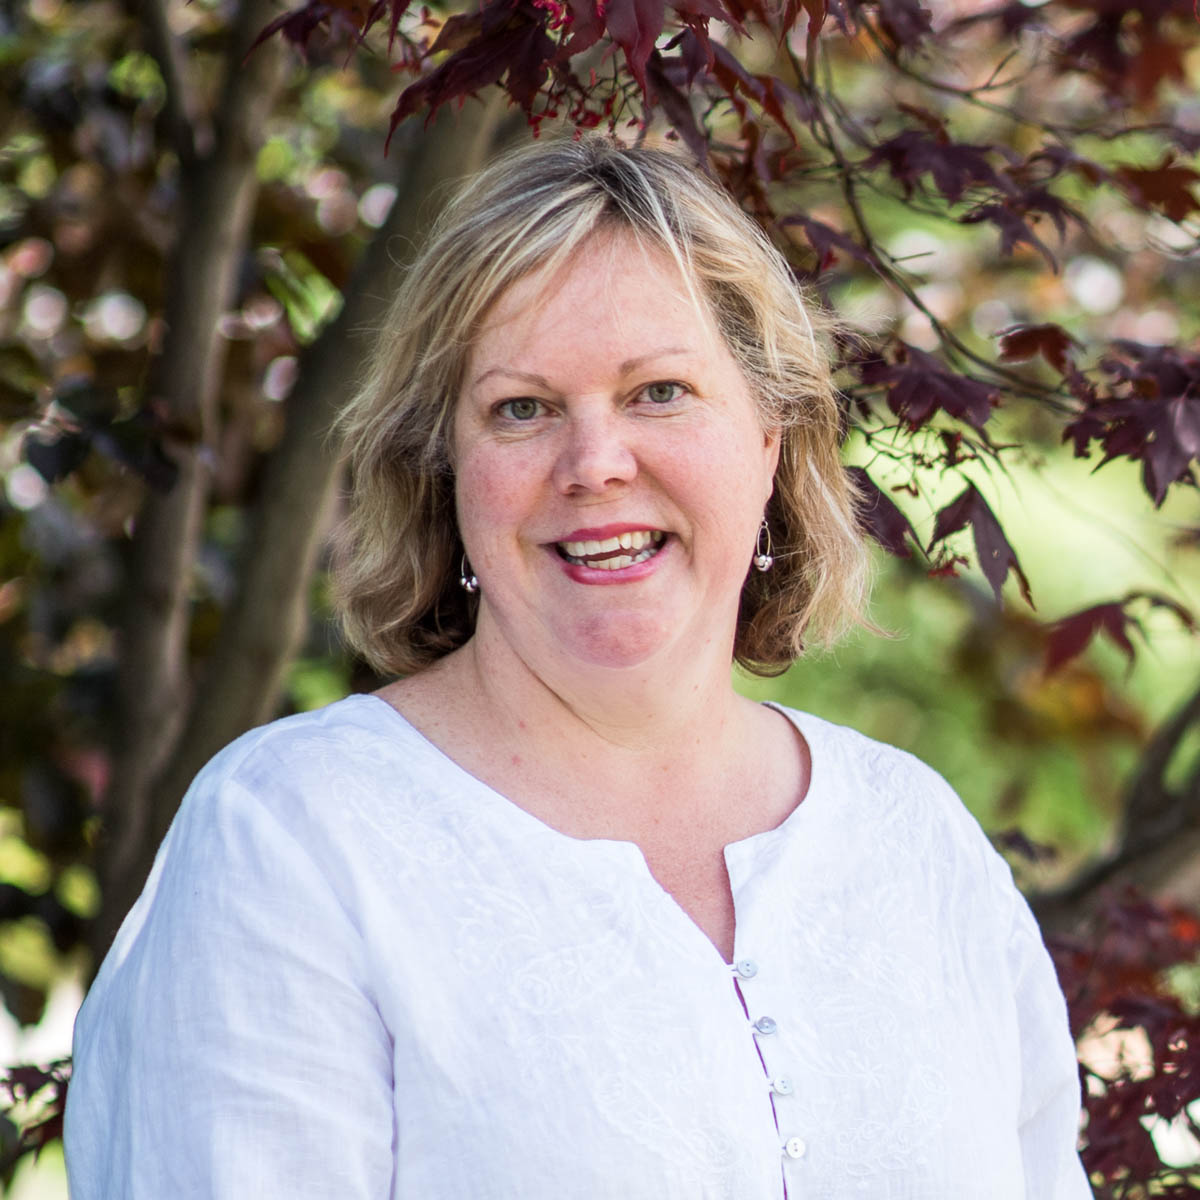 Portrait of Dr. Helen Hambly